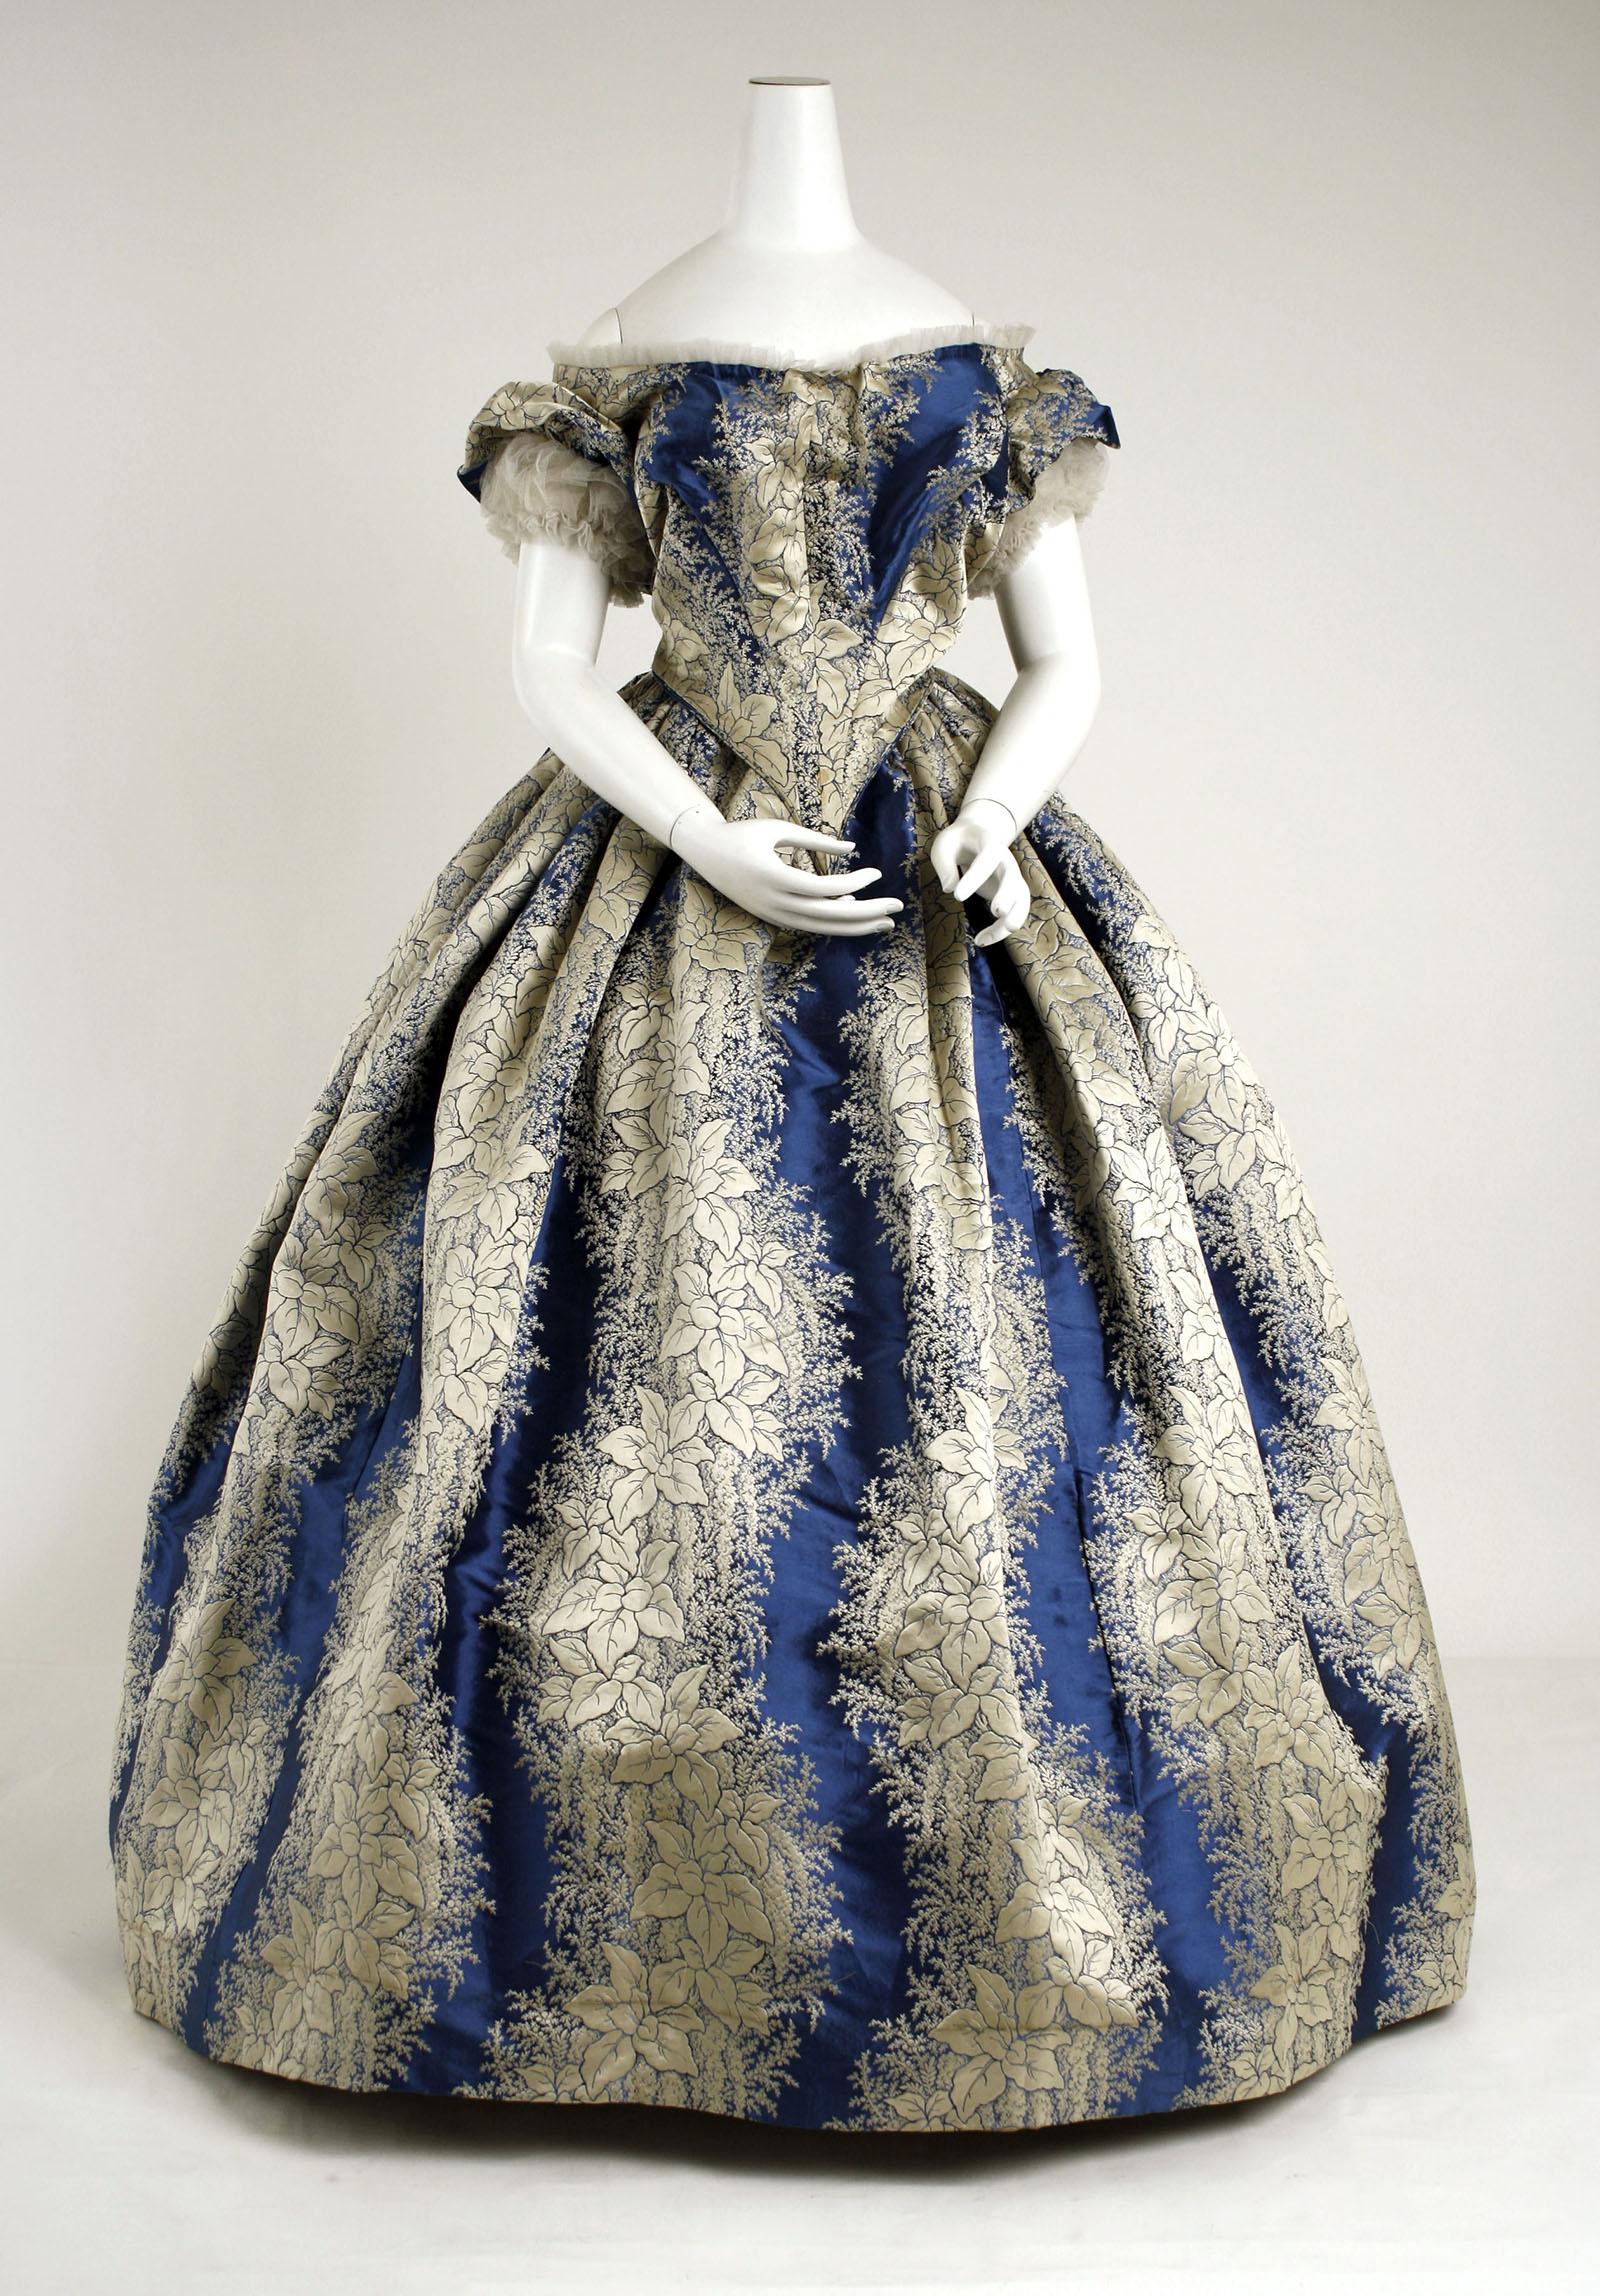 Evening dress, circa 1855-58, The Metropolitan Museum of Art, New York